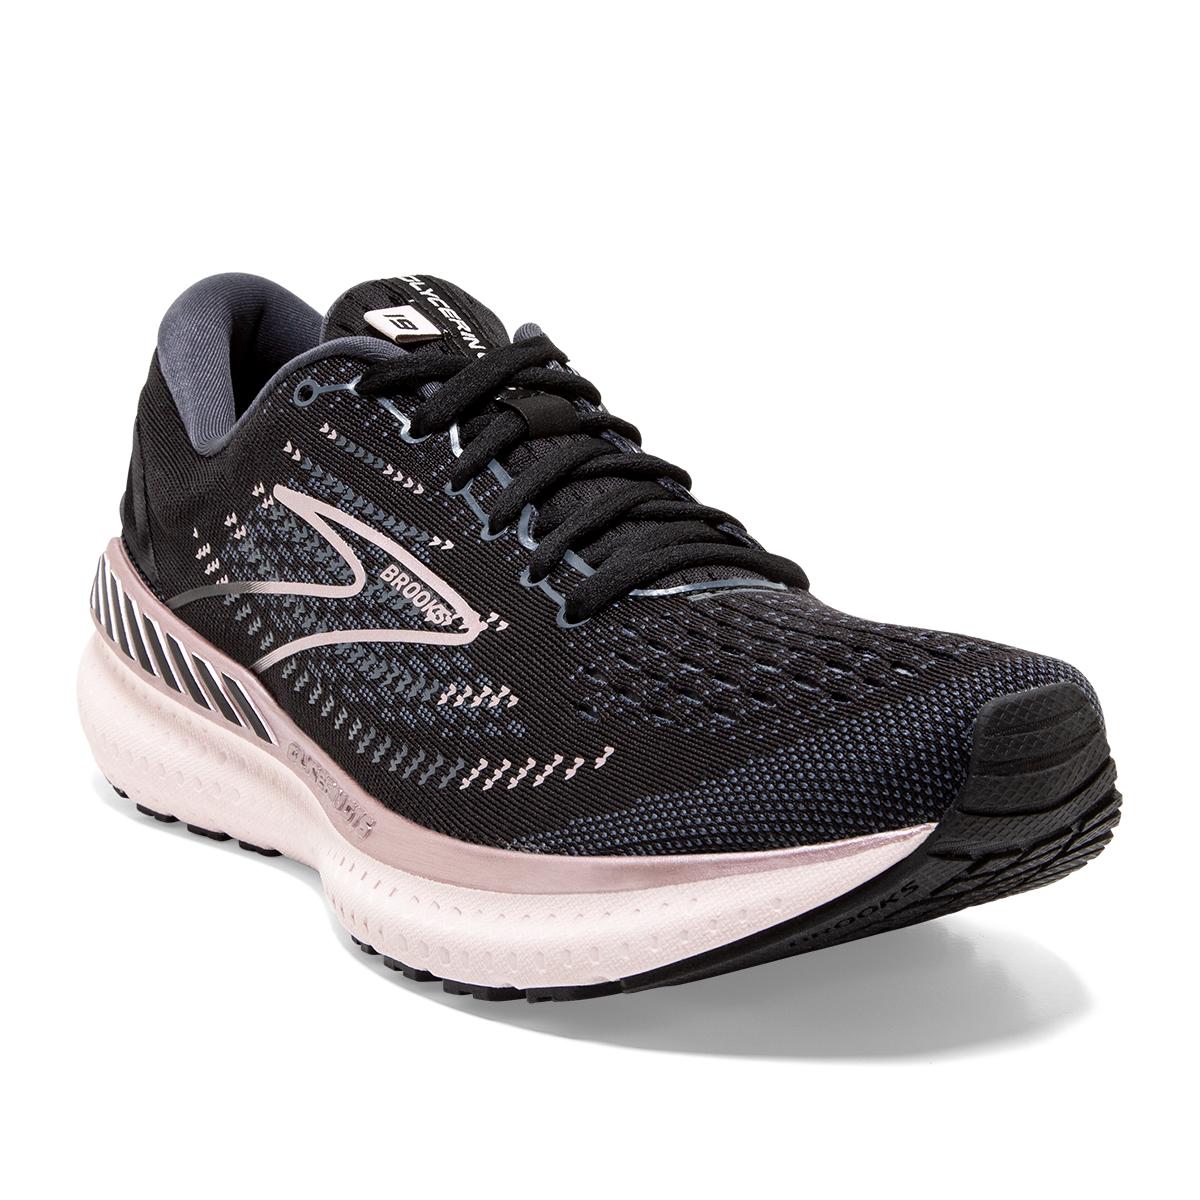 Women's Brooks Glycerin GTS 19 Running Shoe - Color: Black/Ombre/Metallic - Size: 7.5 - Width: Regular, Black/Ombre/Metallic, large, image 4